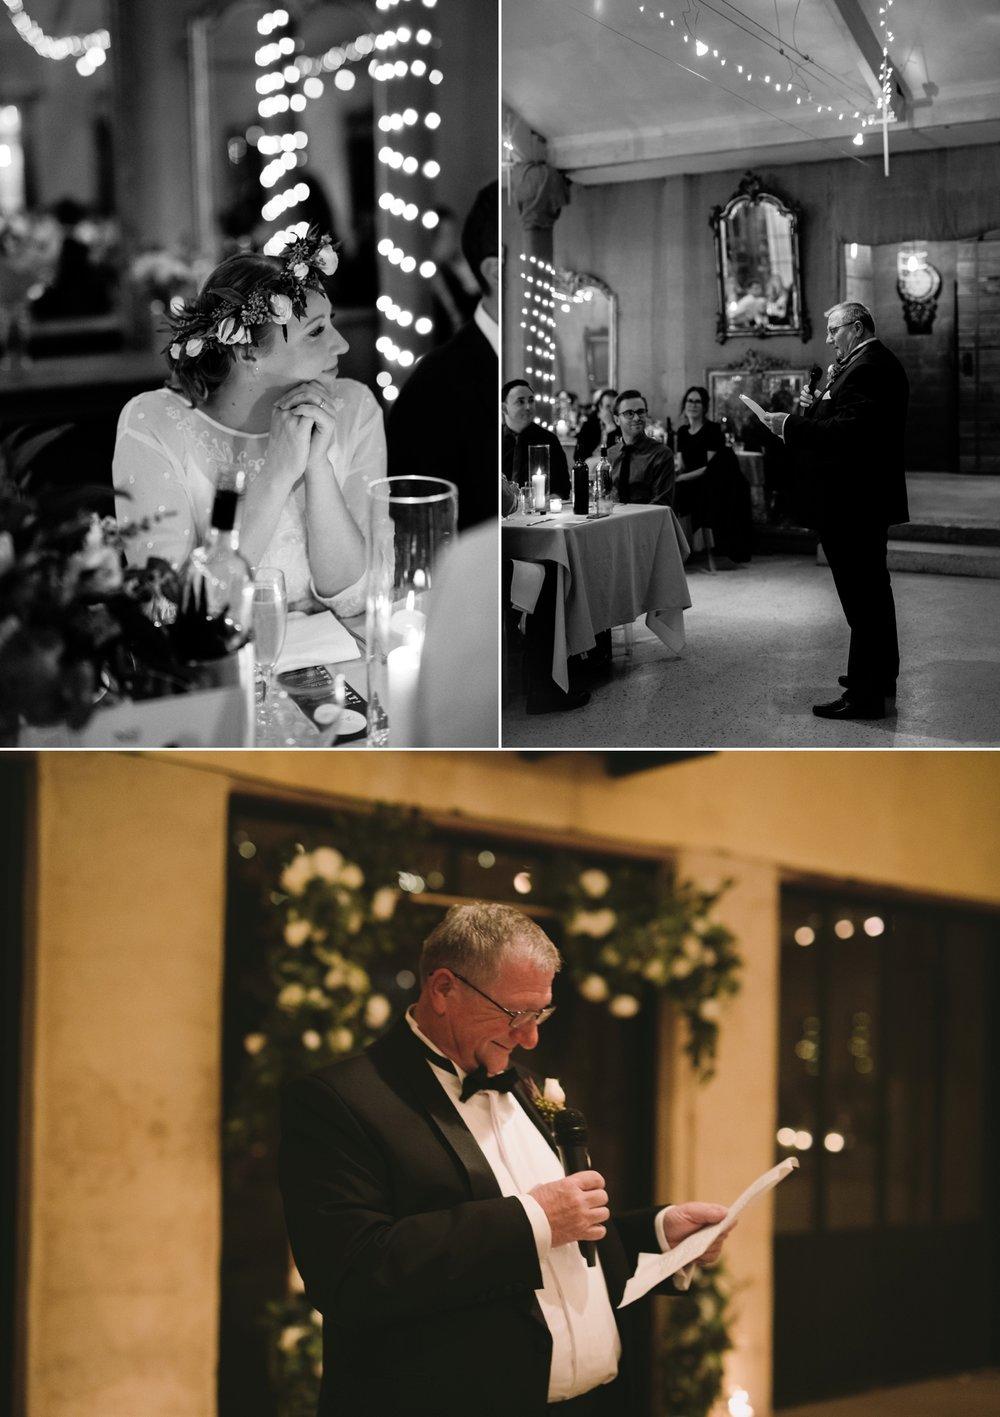 Jo & Aaron - Natural Wedding Photography in Adelaide - Beautiful, modern wedding photographer - Al Ru Farm Wedding Photography - Katherine Schultz_0043.jpg